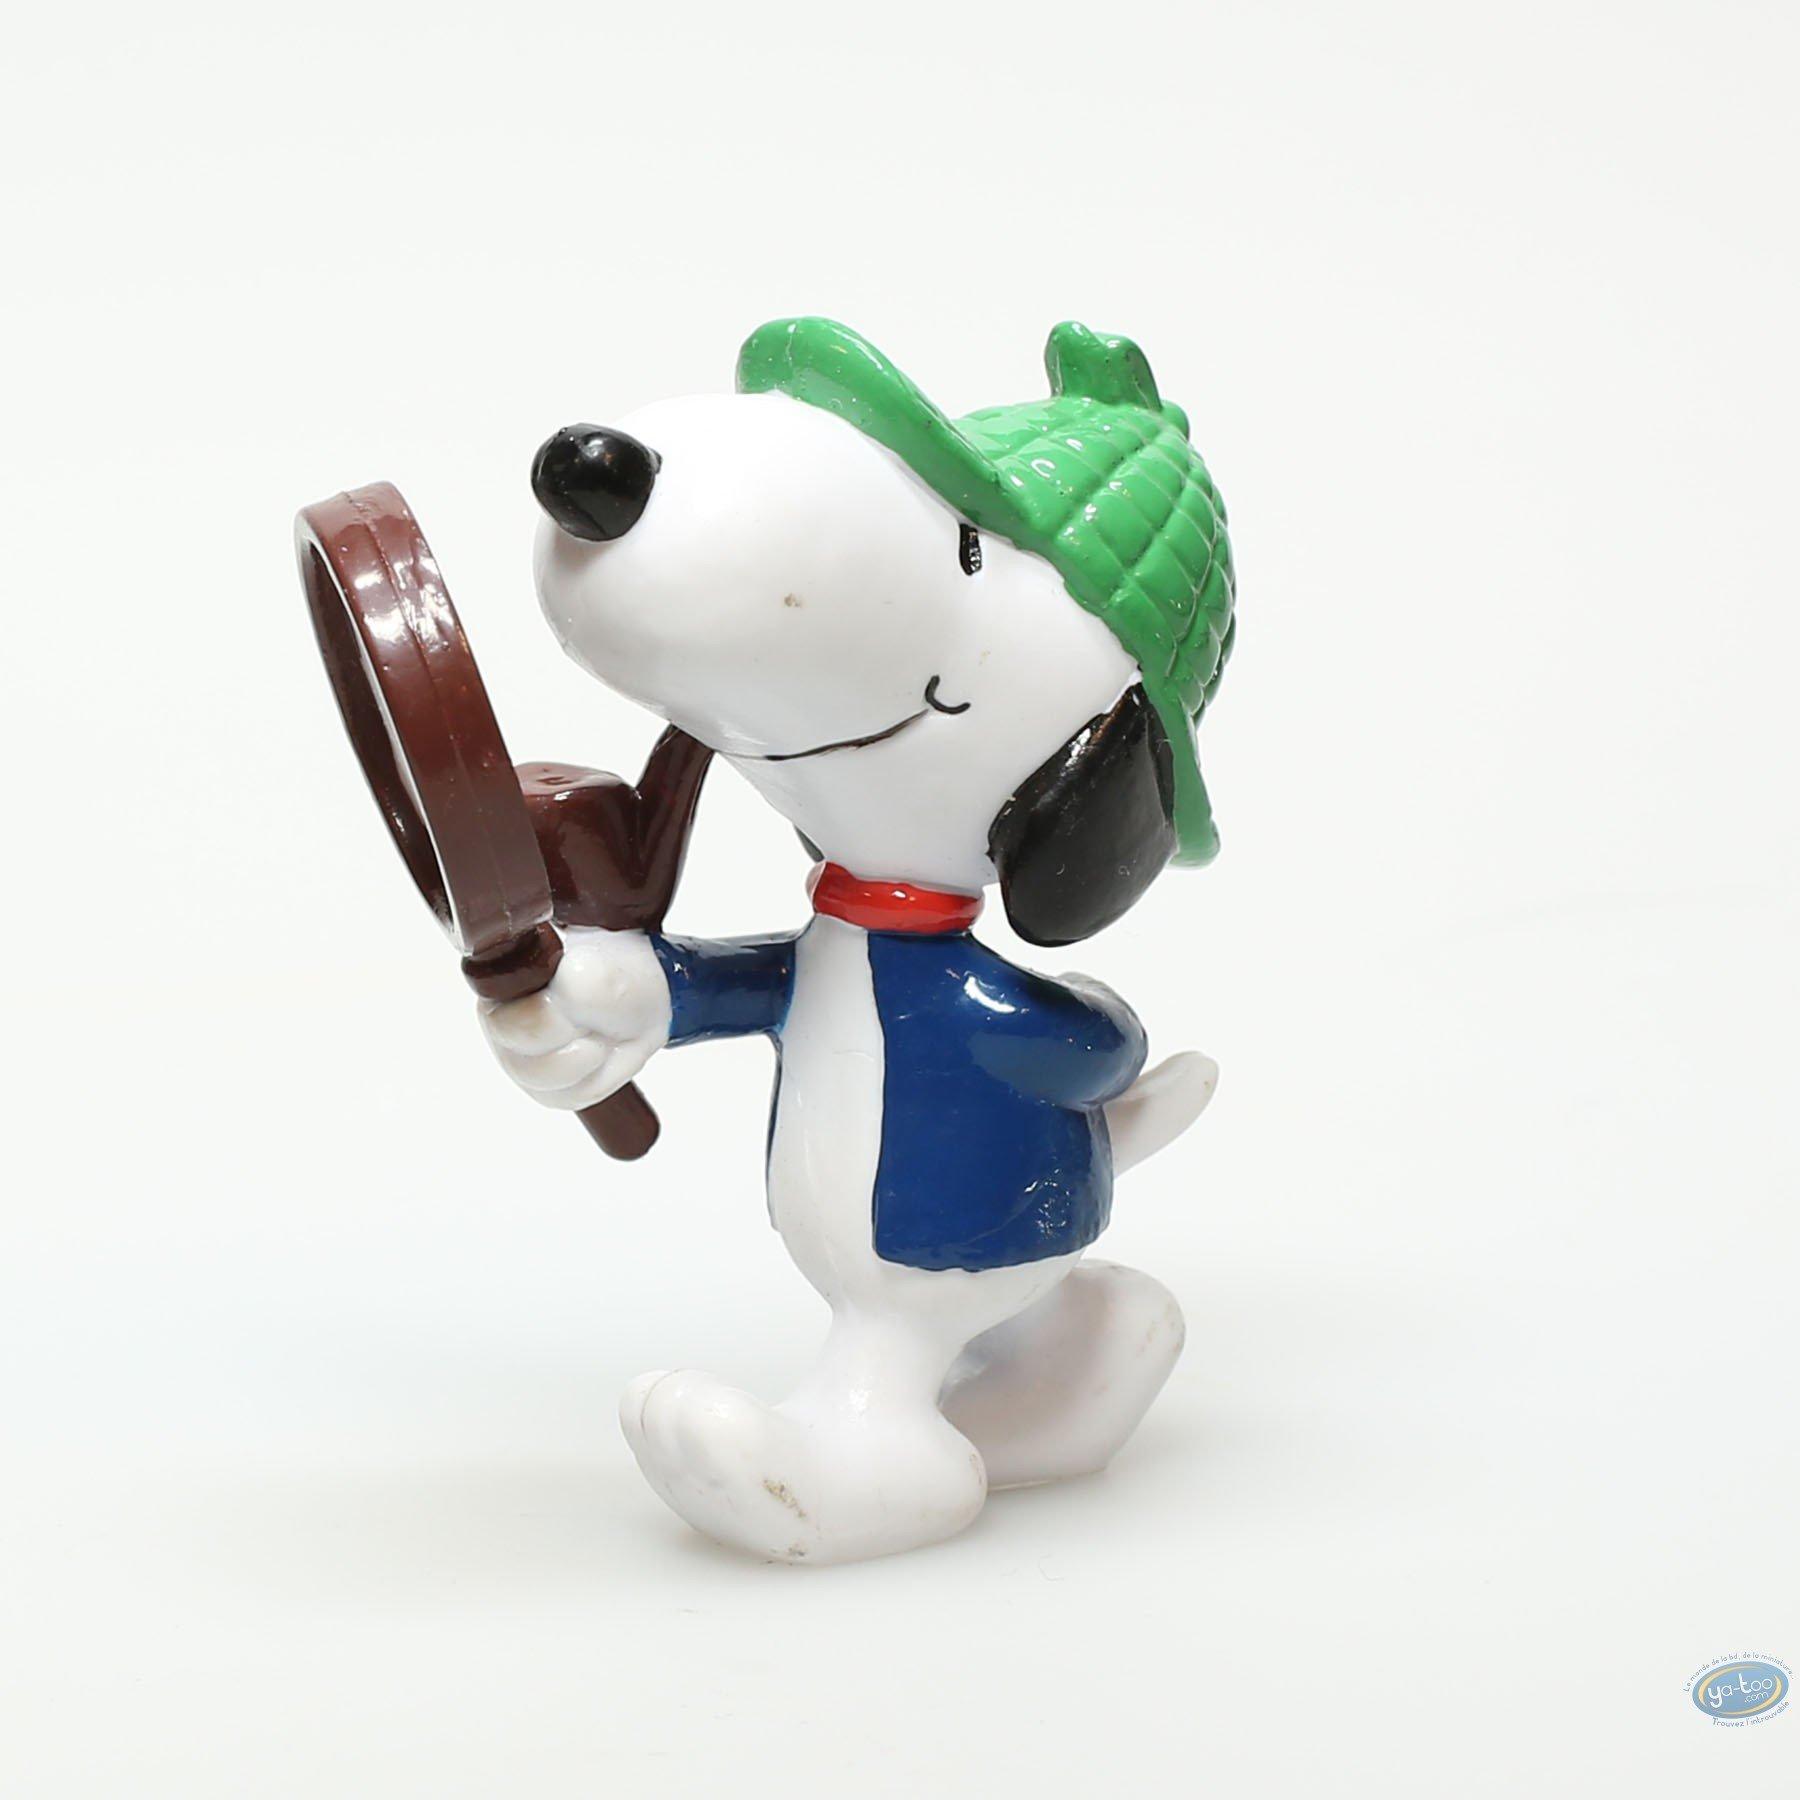 Figurine plastique, Snoopy : Snoopy détective, Sherlock Holmes